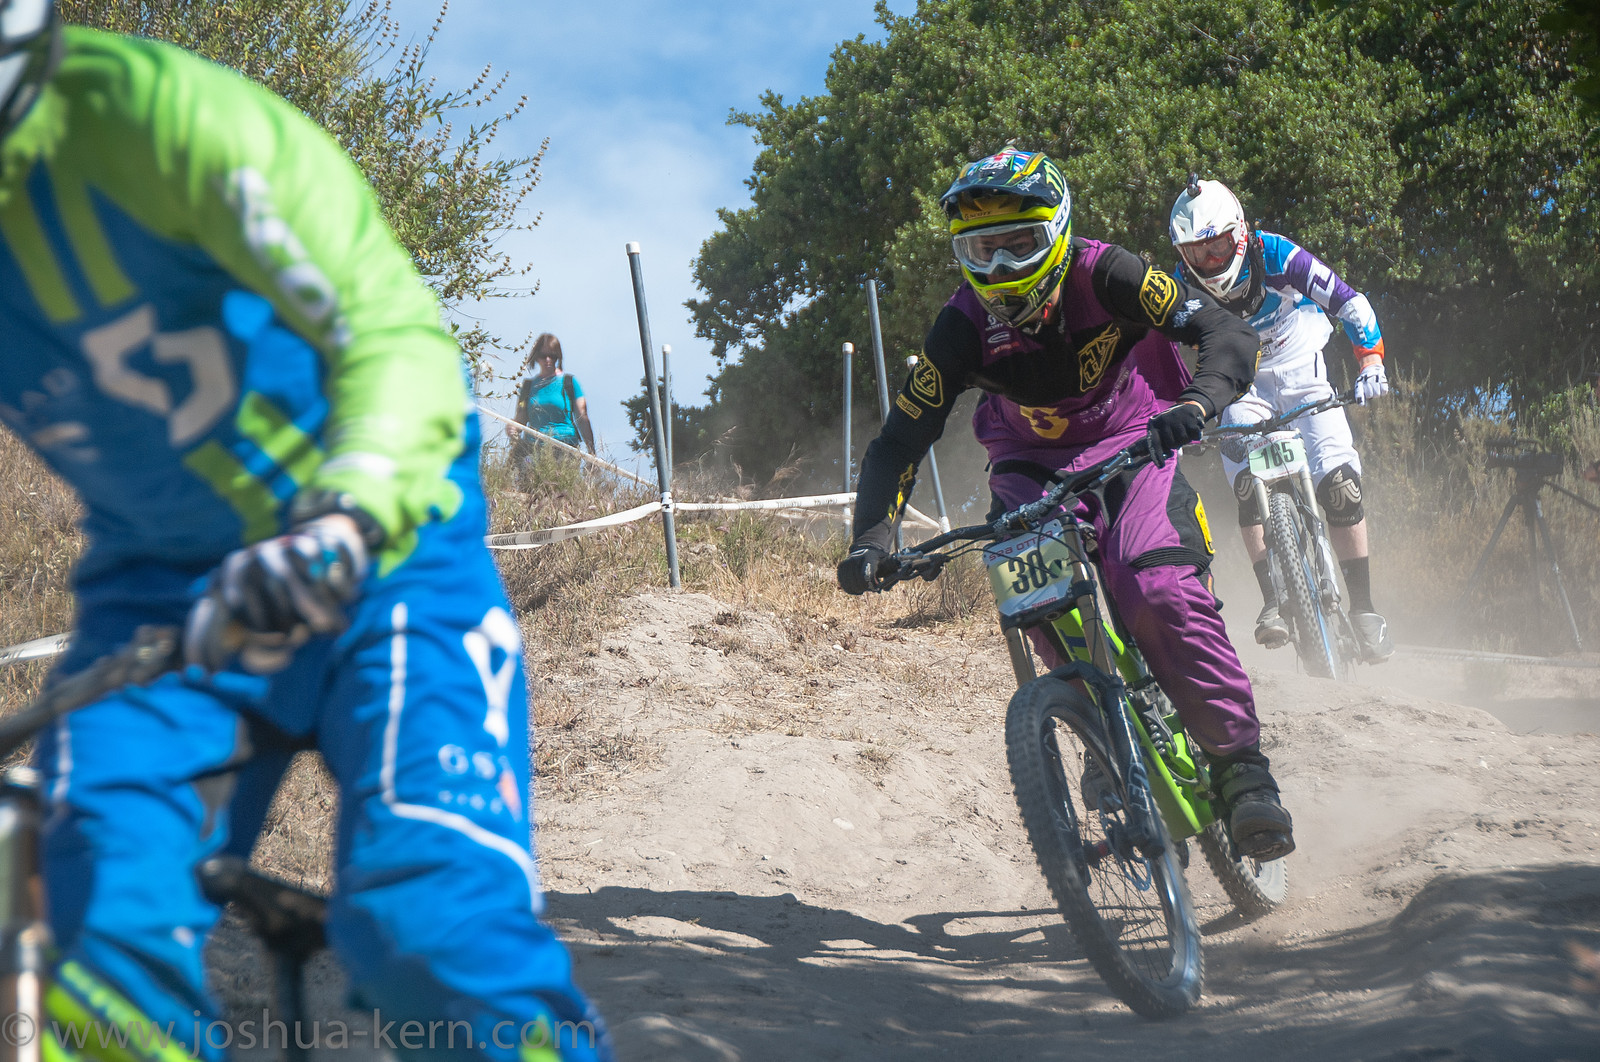 4-19-13DHPractice (31 of 36) - jkern620 - Mountain Biking Pictures - Vital MTB